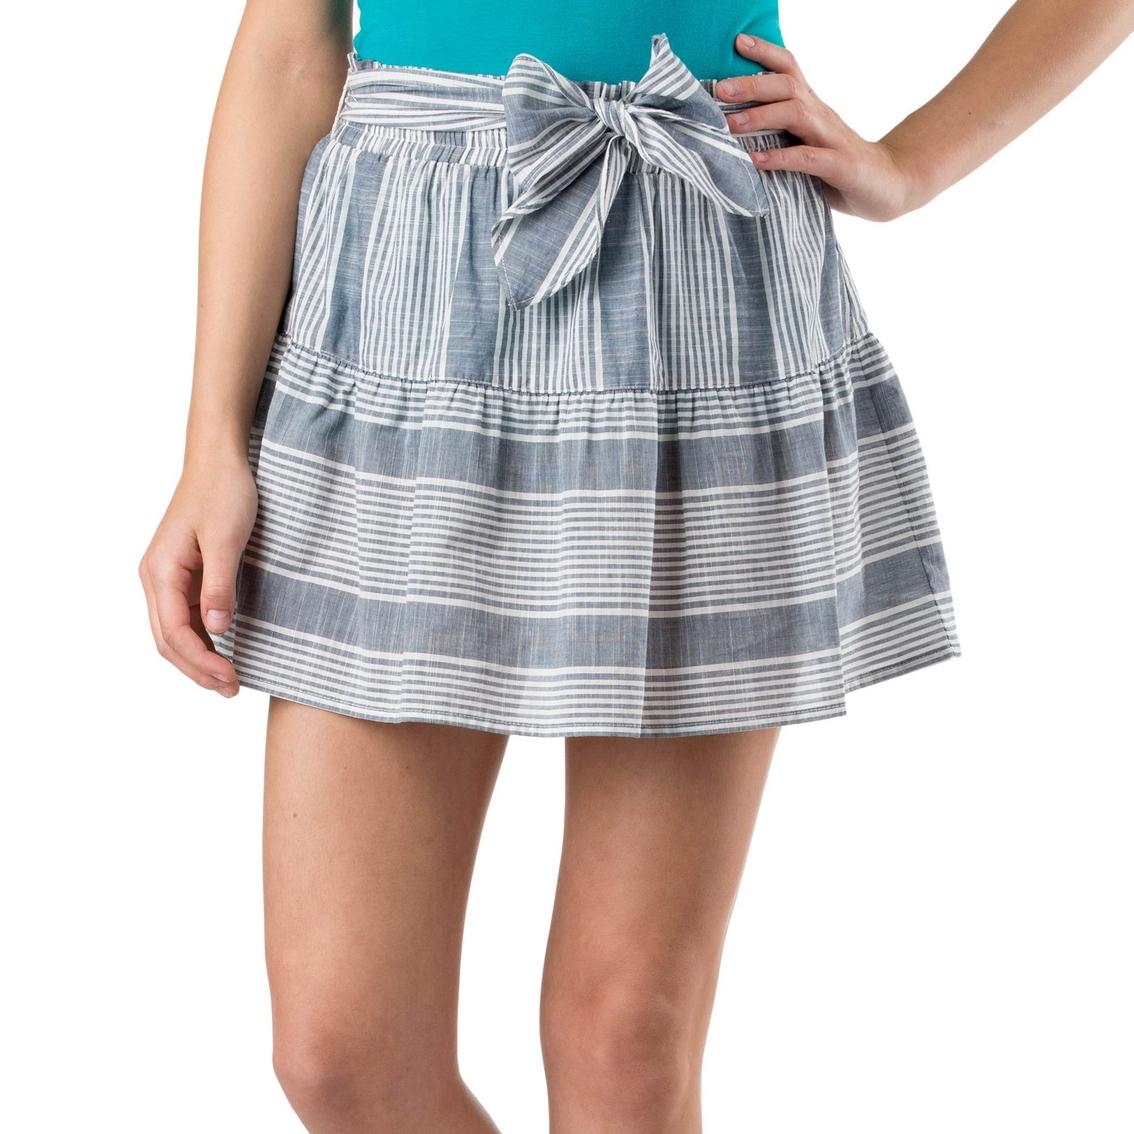 1fd4546f54a9 Joe B Juniors Chambray Stripe Skater Skirt | Juniors' Apparel | Shop ...